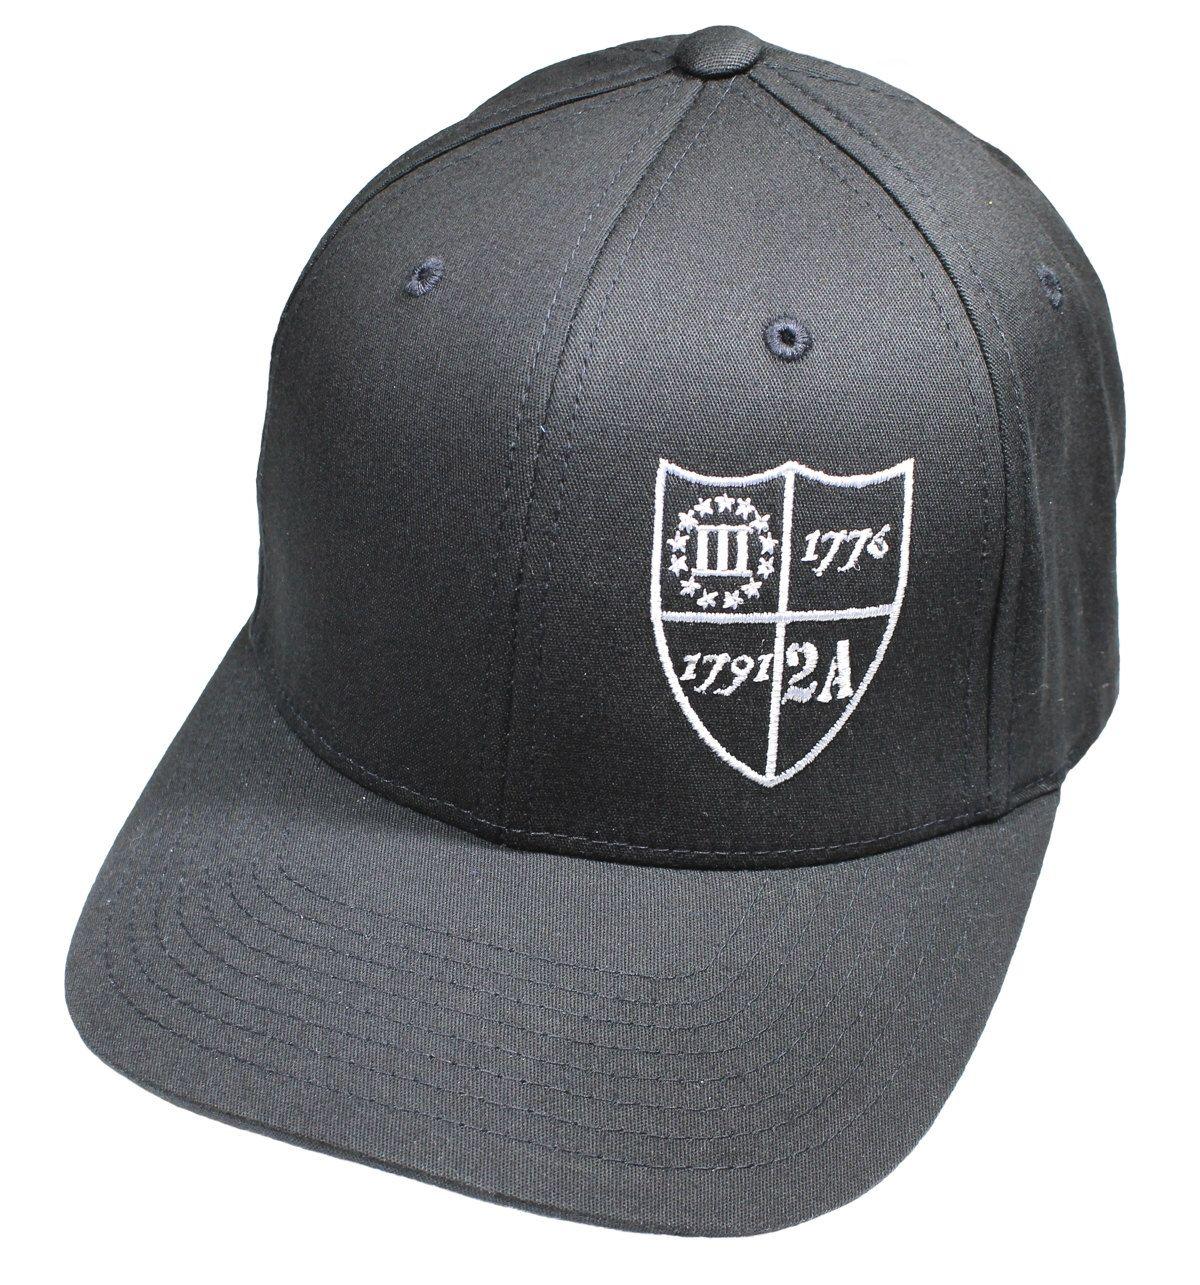 3fe6c19f3 Molon Labe Patriotic Flexfit Twill Hat - 2nd Amendment Shield ...